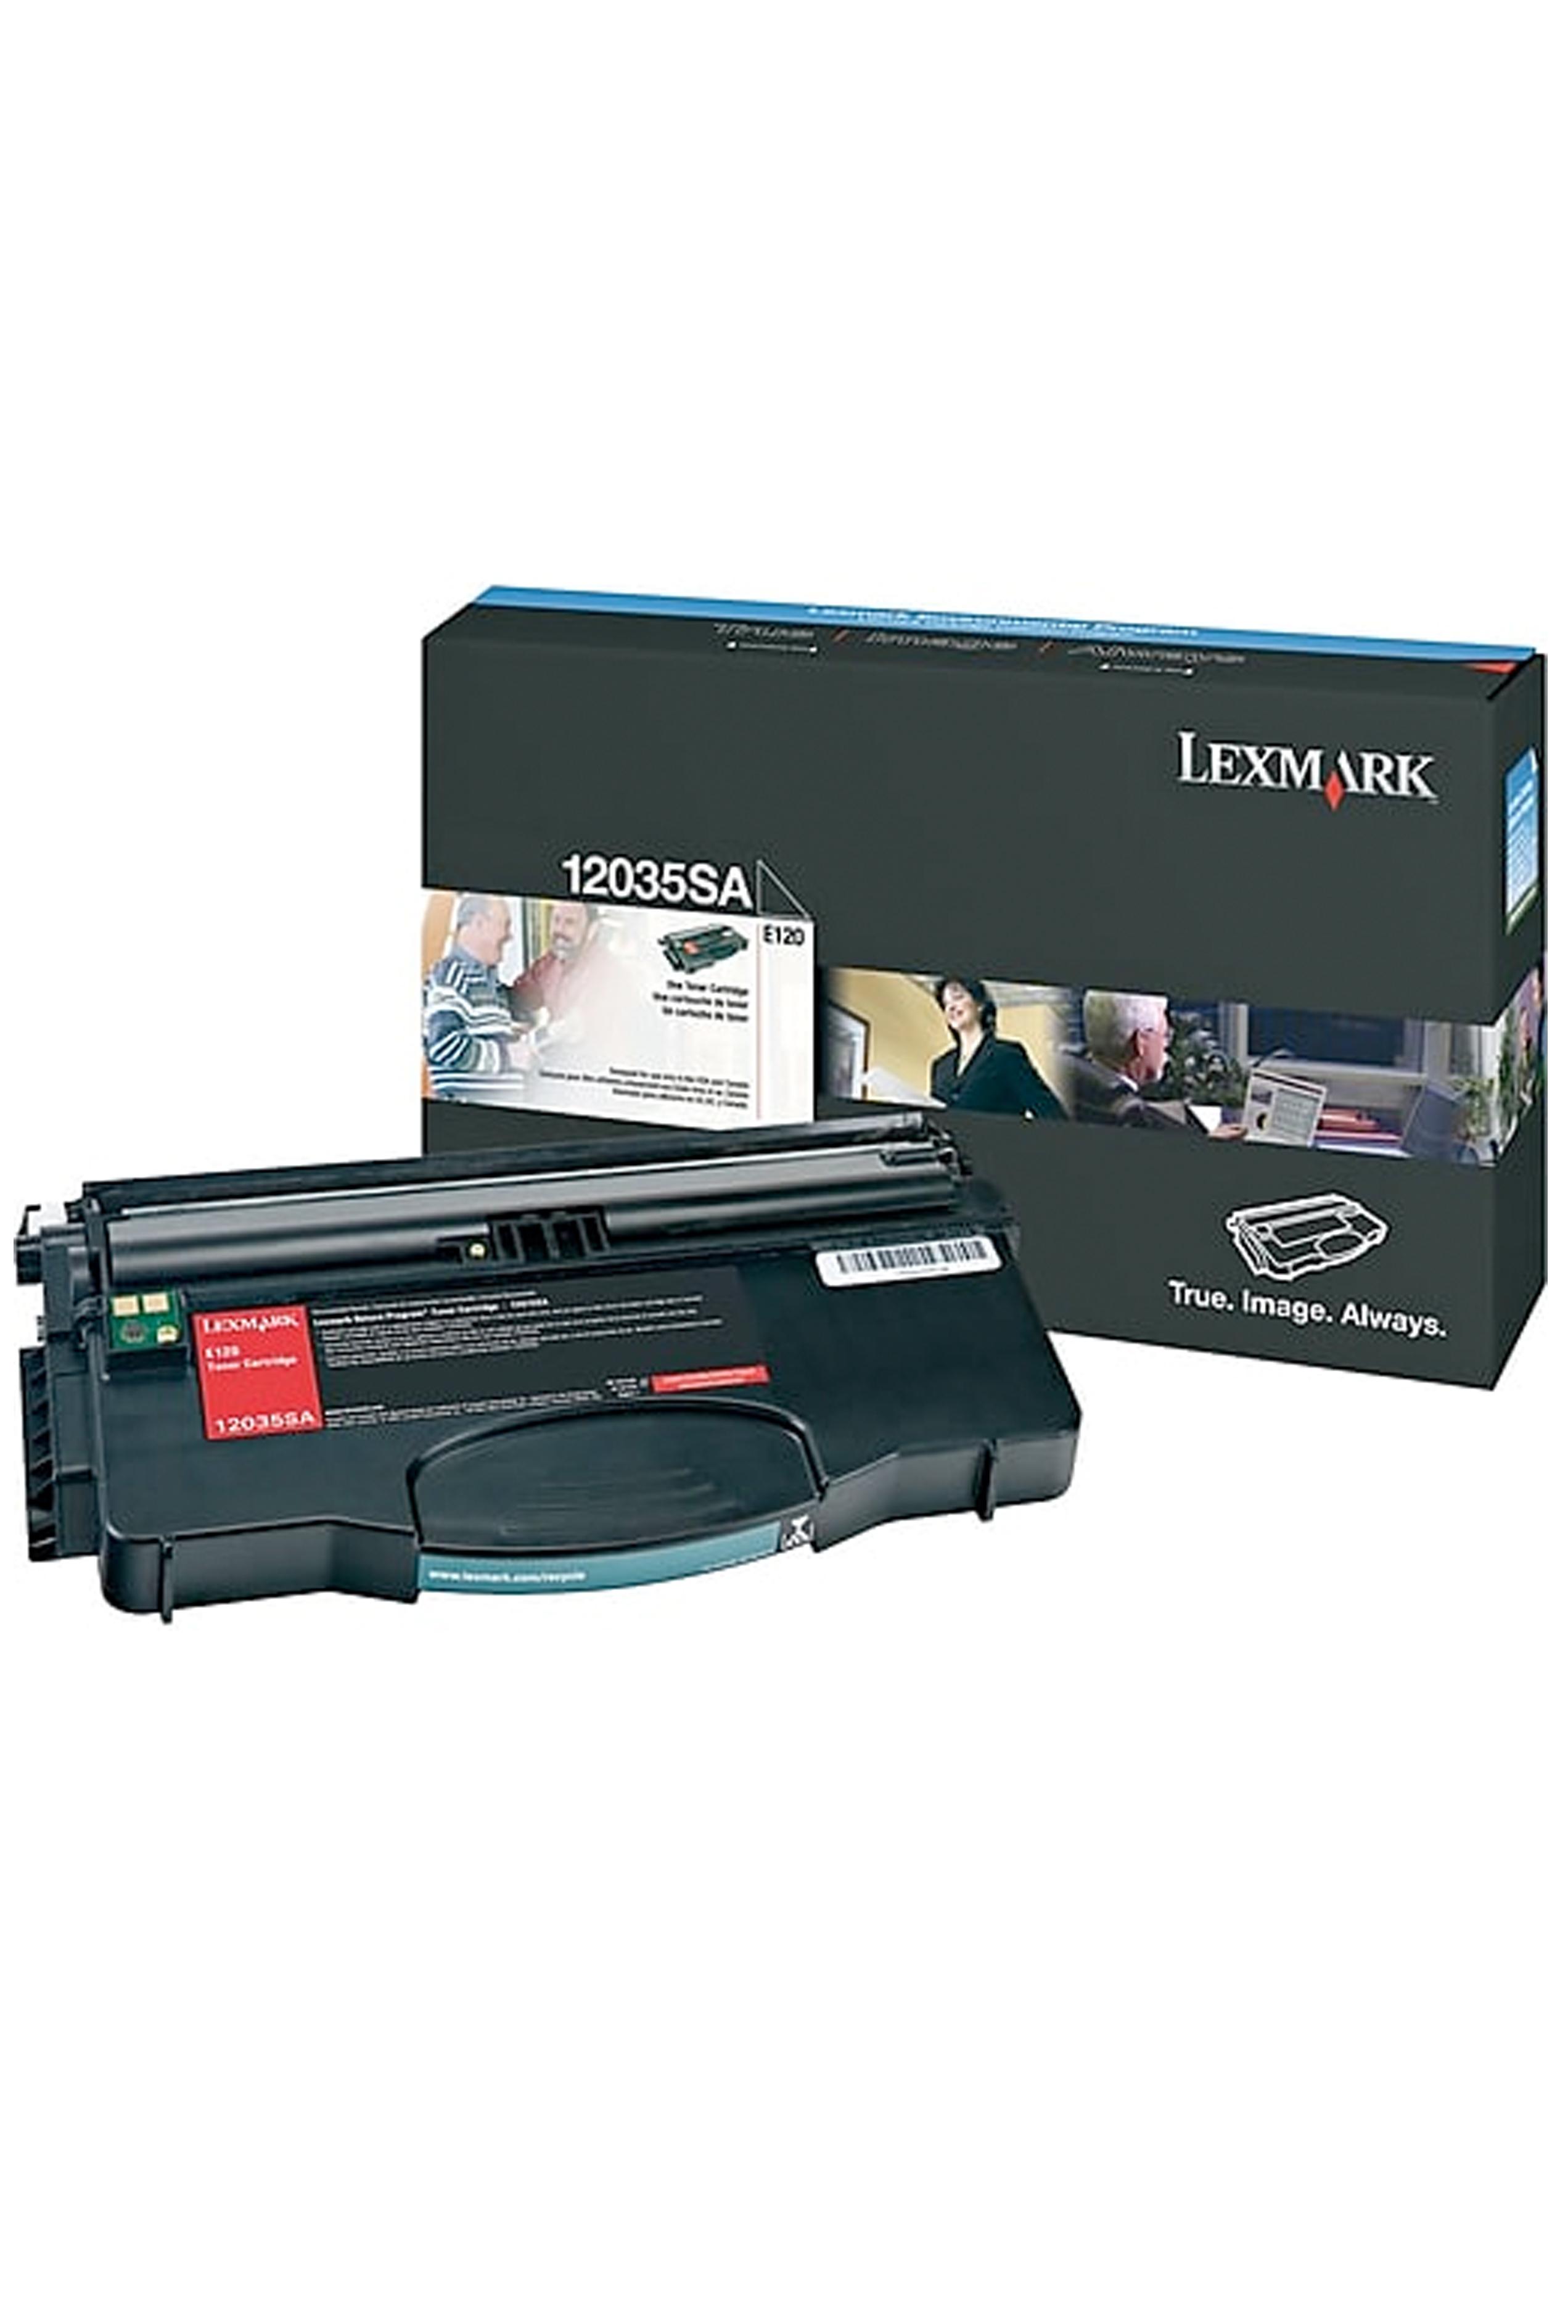 Lexmark LEXMARK E120 - 2K REGULAR TONER CARTRIDGE (12035SA)